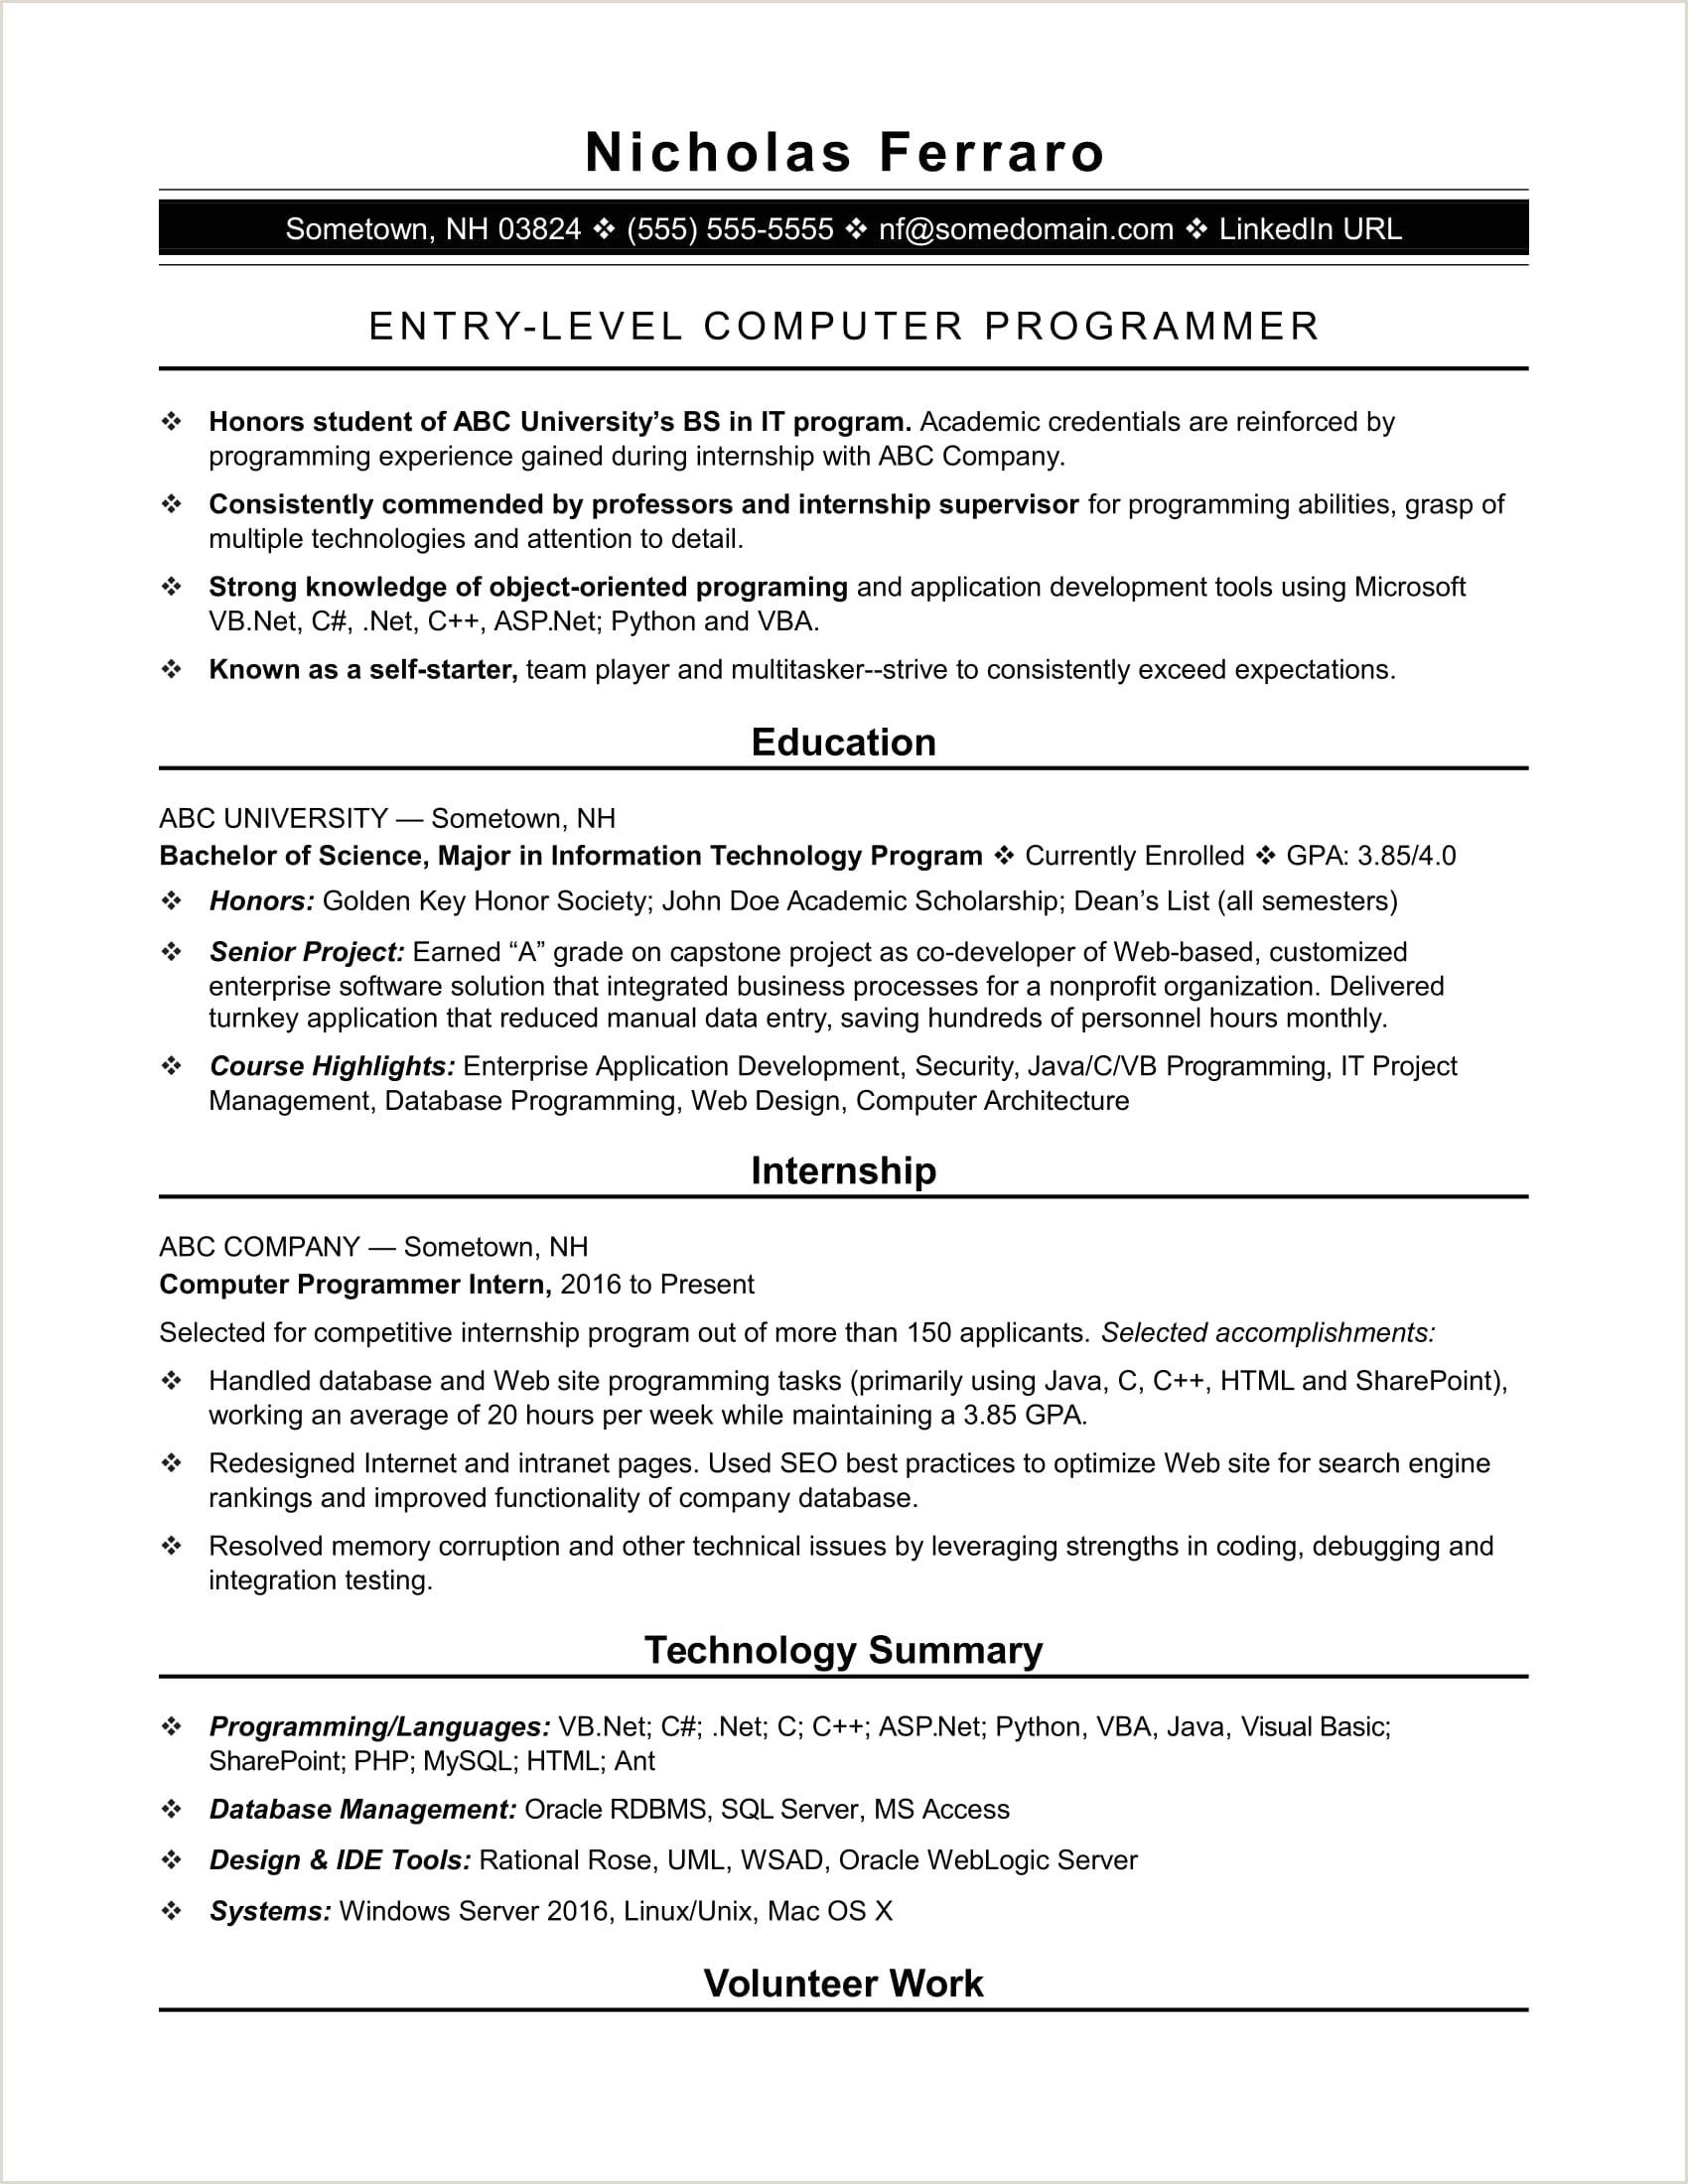 Bangladeshi Standard Cv format Standard Cv format Bangladesh Professional Resumes Sample